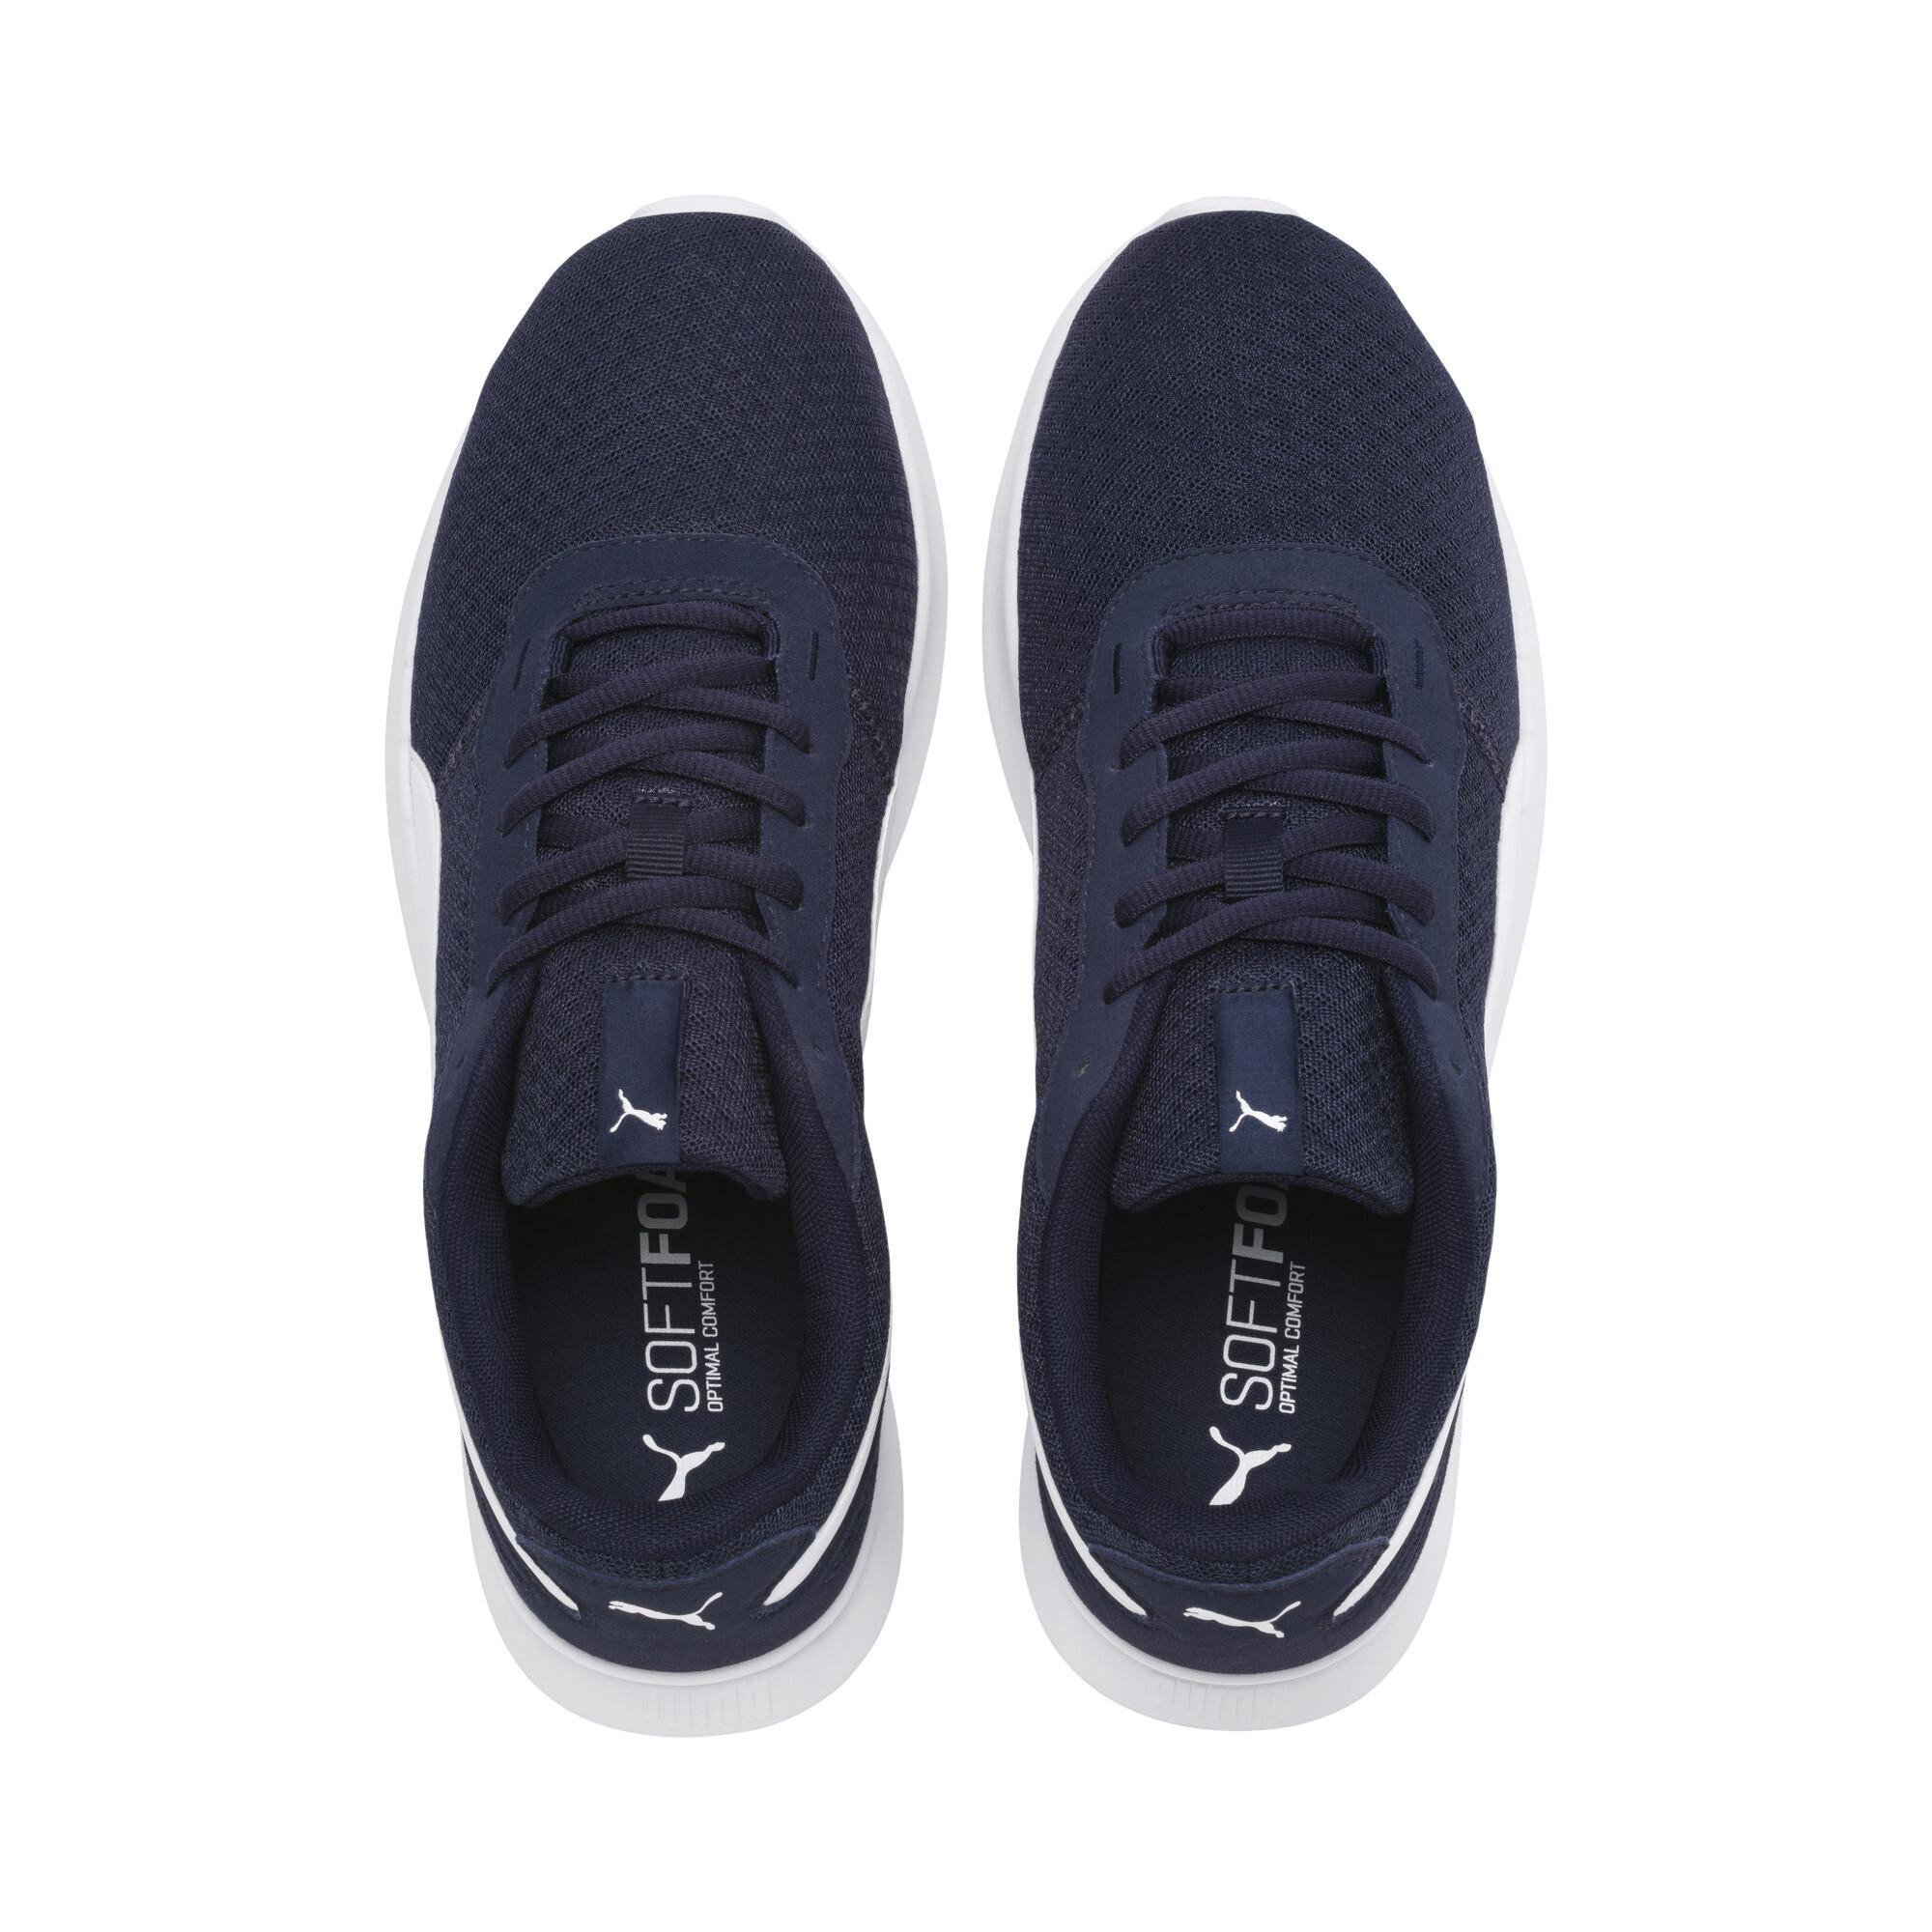 PUMA-Men-039-s-ST-Activate-Sneakers thumbnail 23